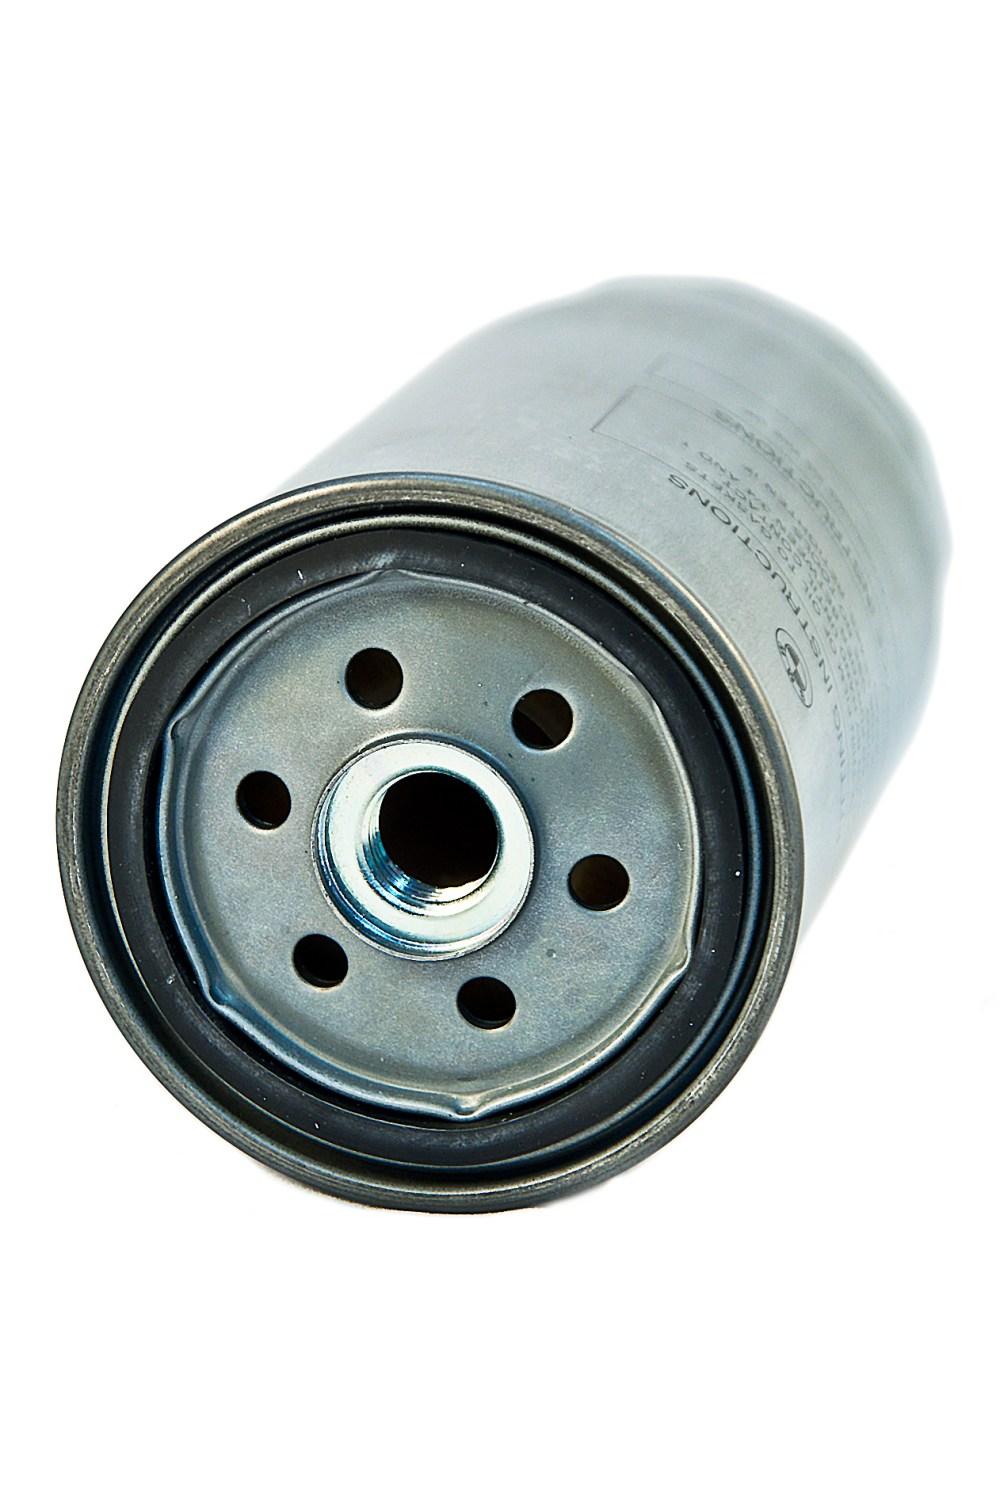 medium resolution of bmw genuine fuel filter cartridge element e36 e39 3 5 series diesel 13327786647